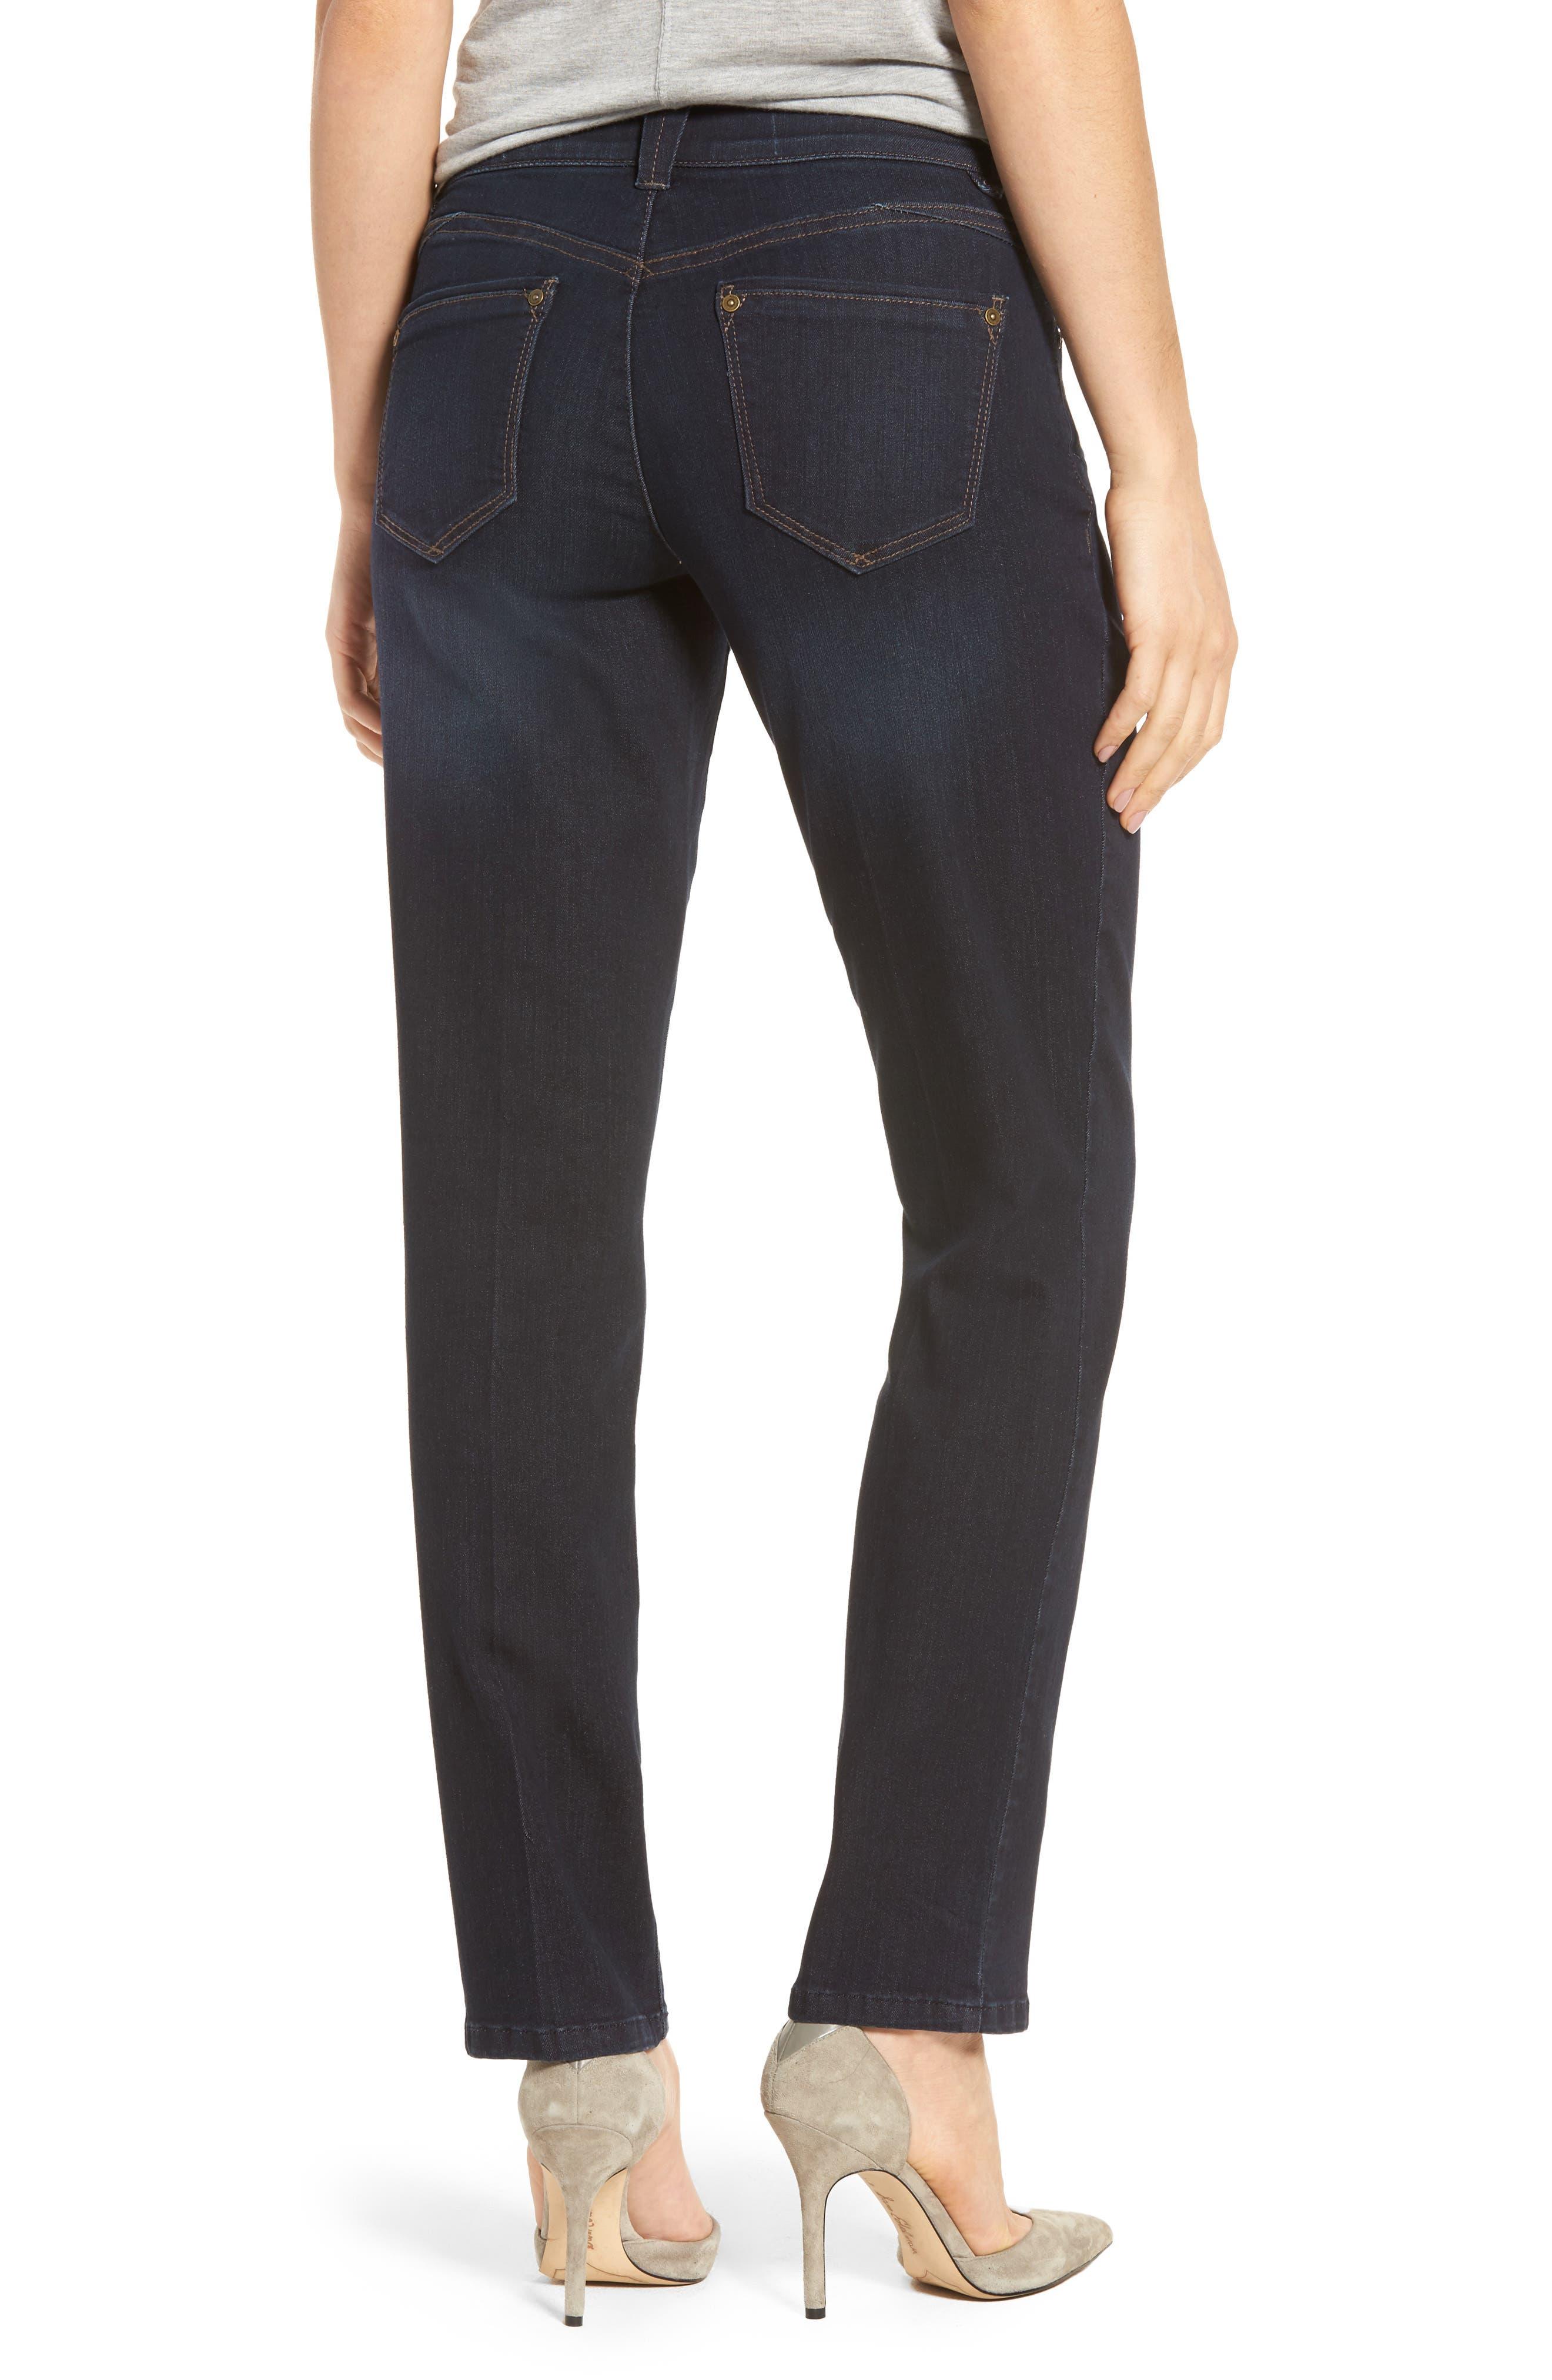 Alternate Image 2  - Wit & Wisdom Ab-solution Straight Leg Jeans (Regular & Petite) (Nordstrom Exclusive)